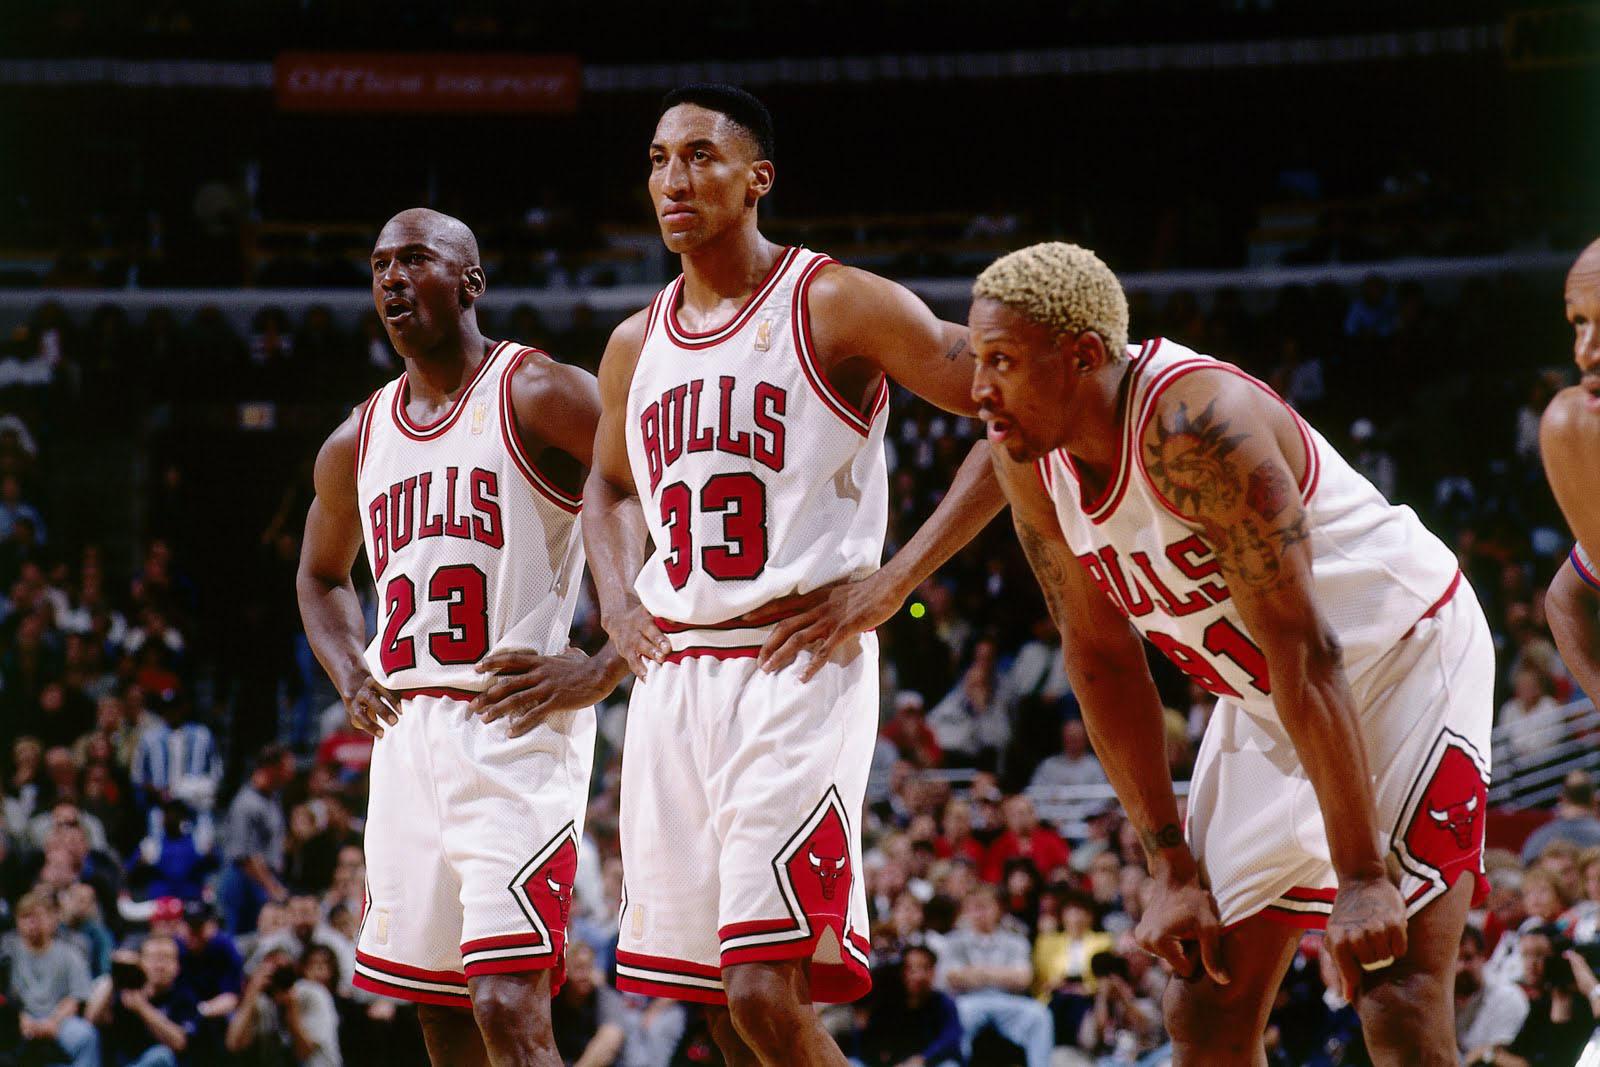 Michael Jordan, Scottie Pippen and Dennis Rodman of the Chicago Bulls in Chicago, 1997.jpg